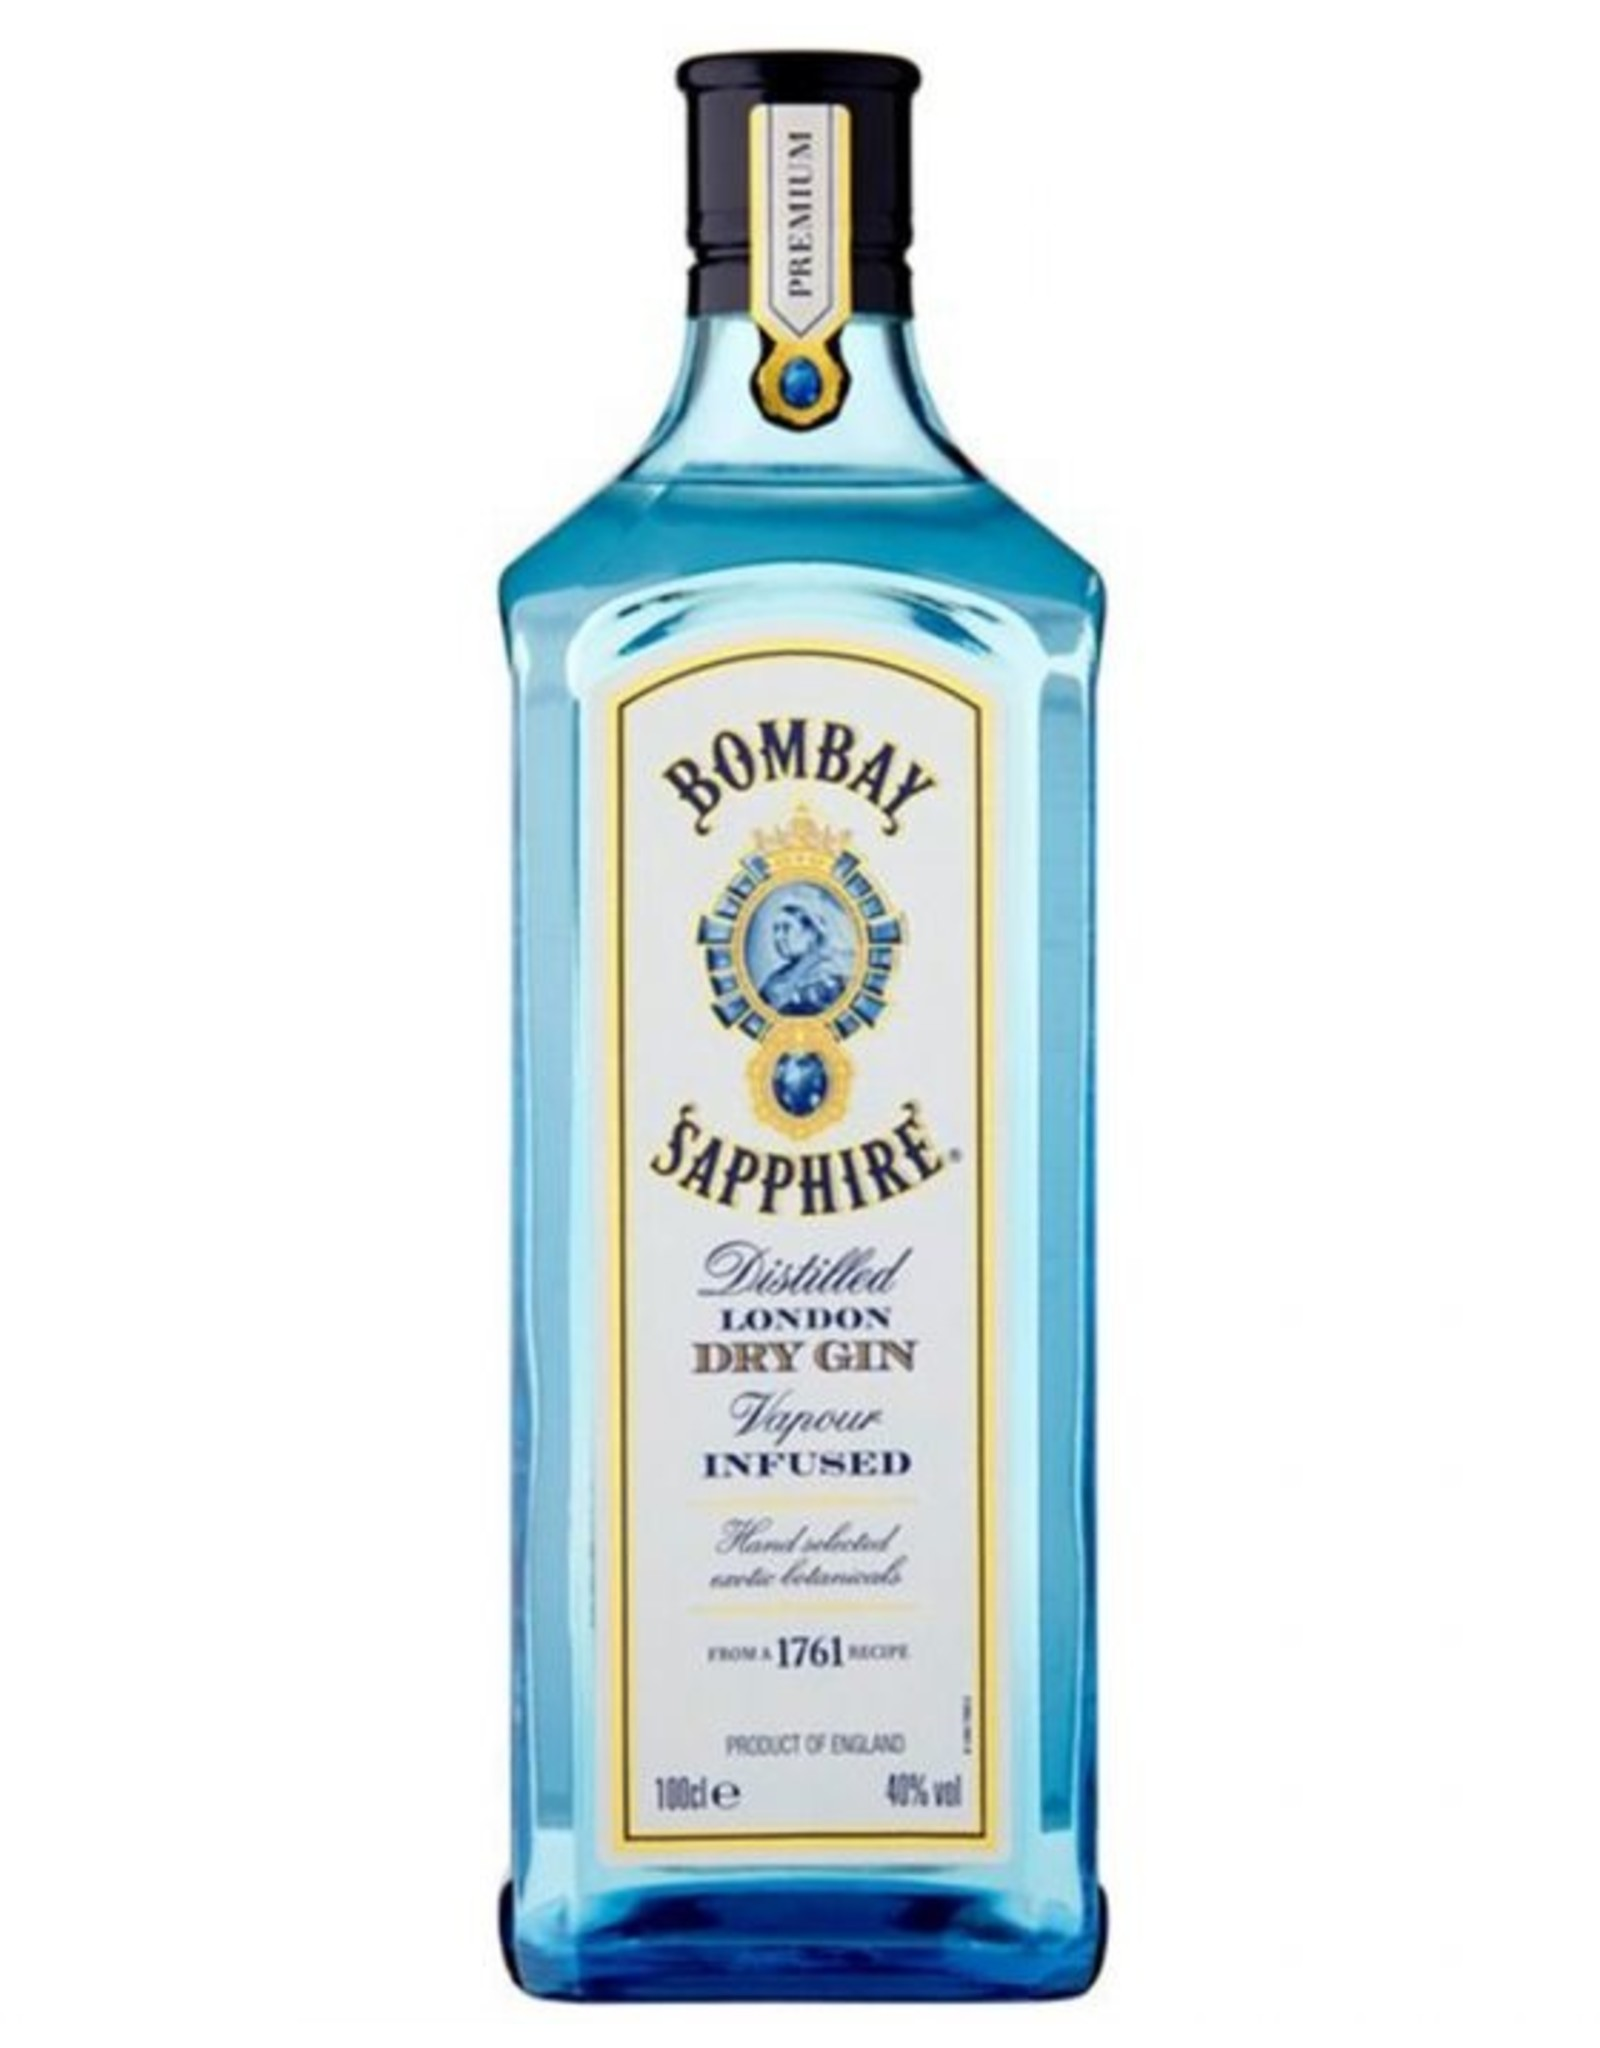 Bombay Bombay Sapphire London Dry Gin 100cl